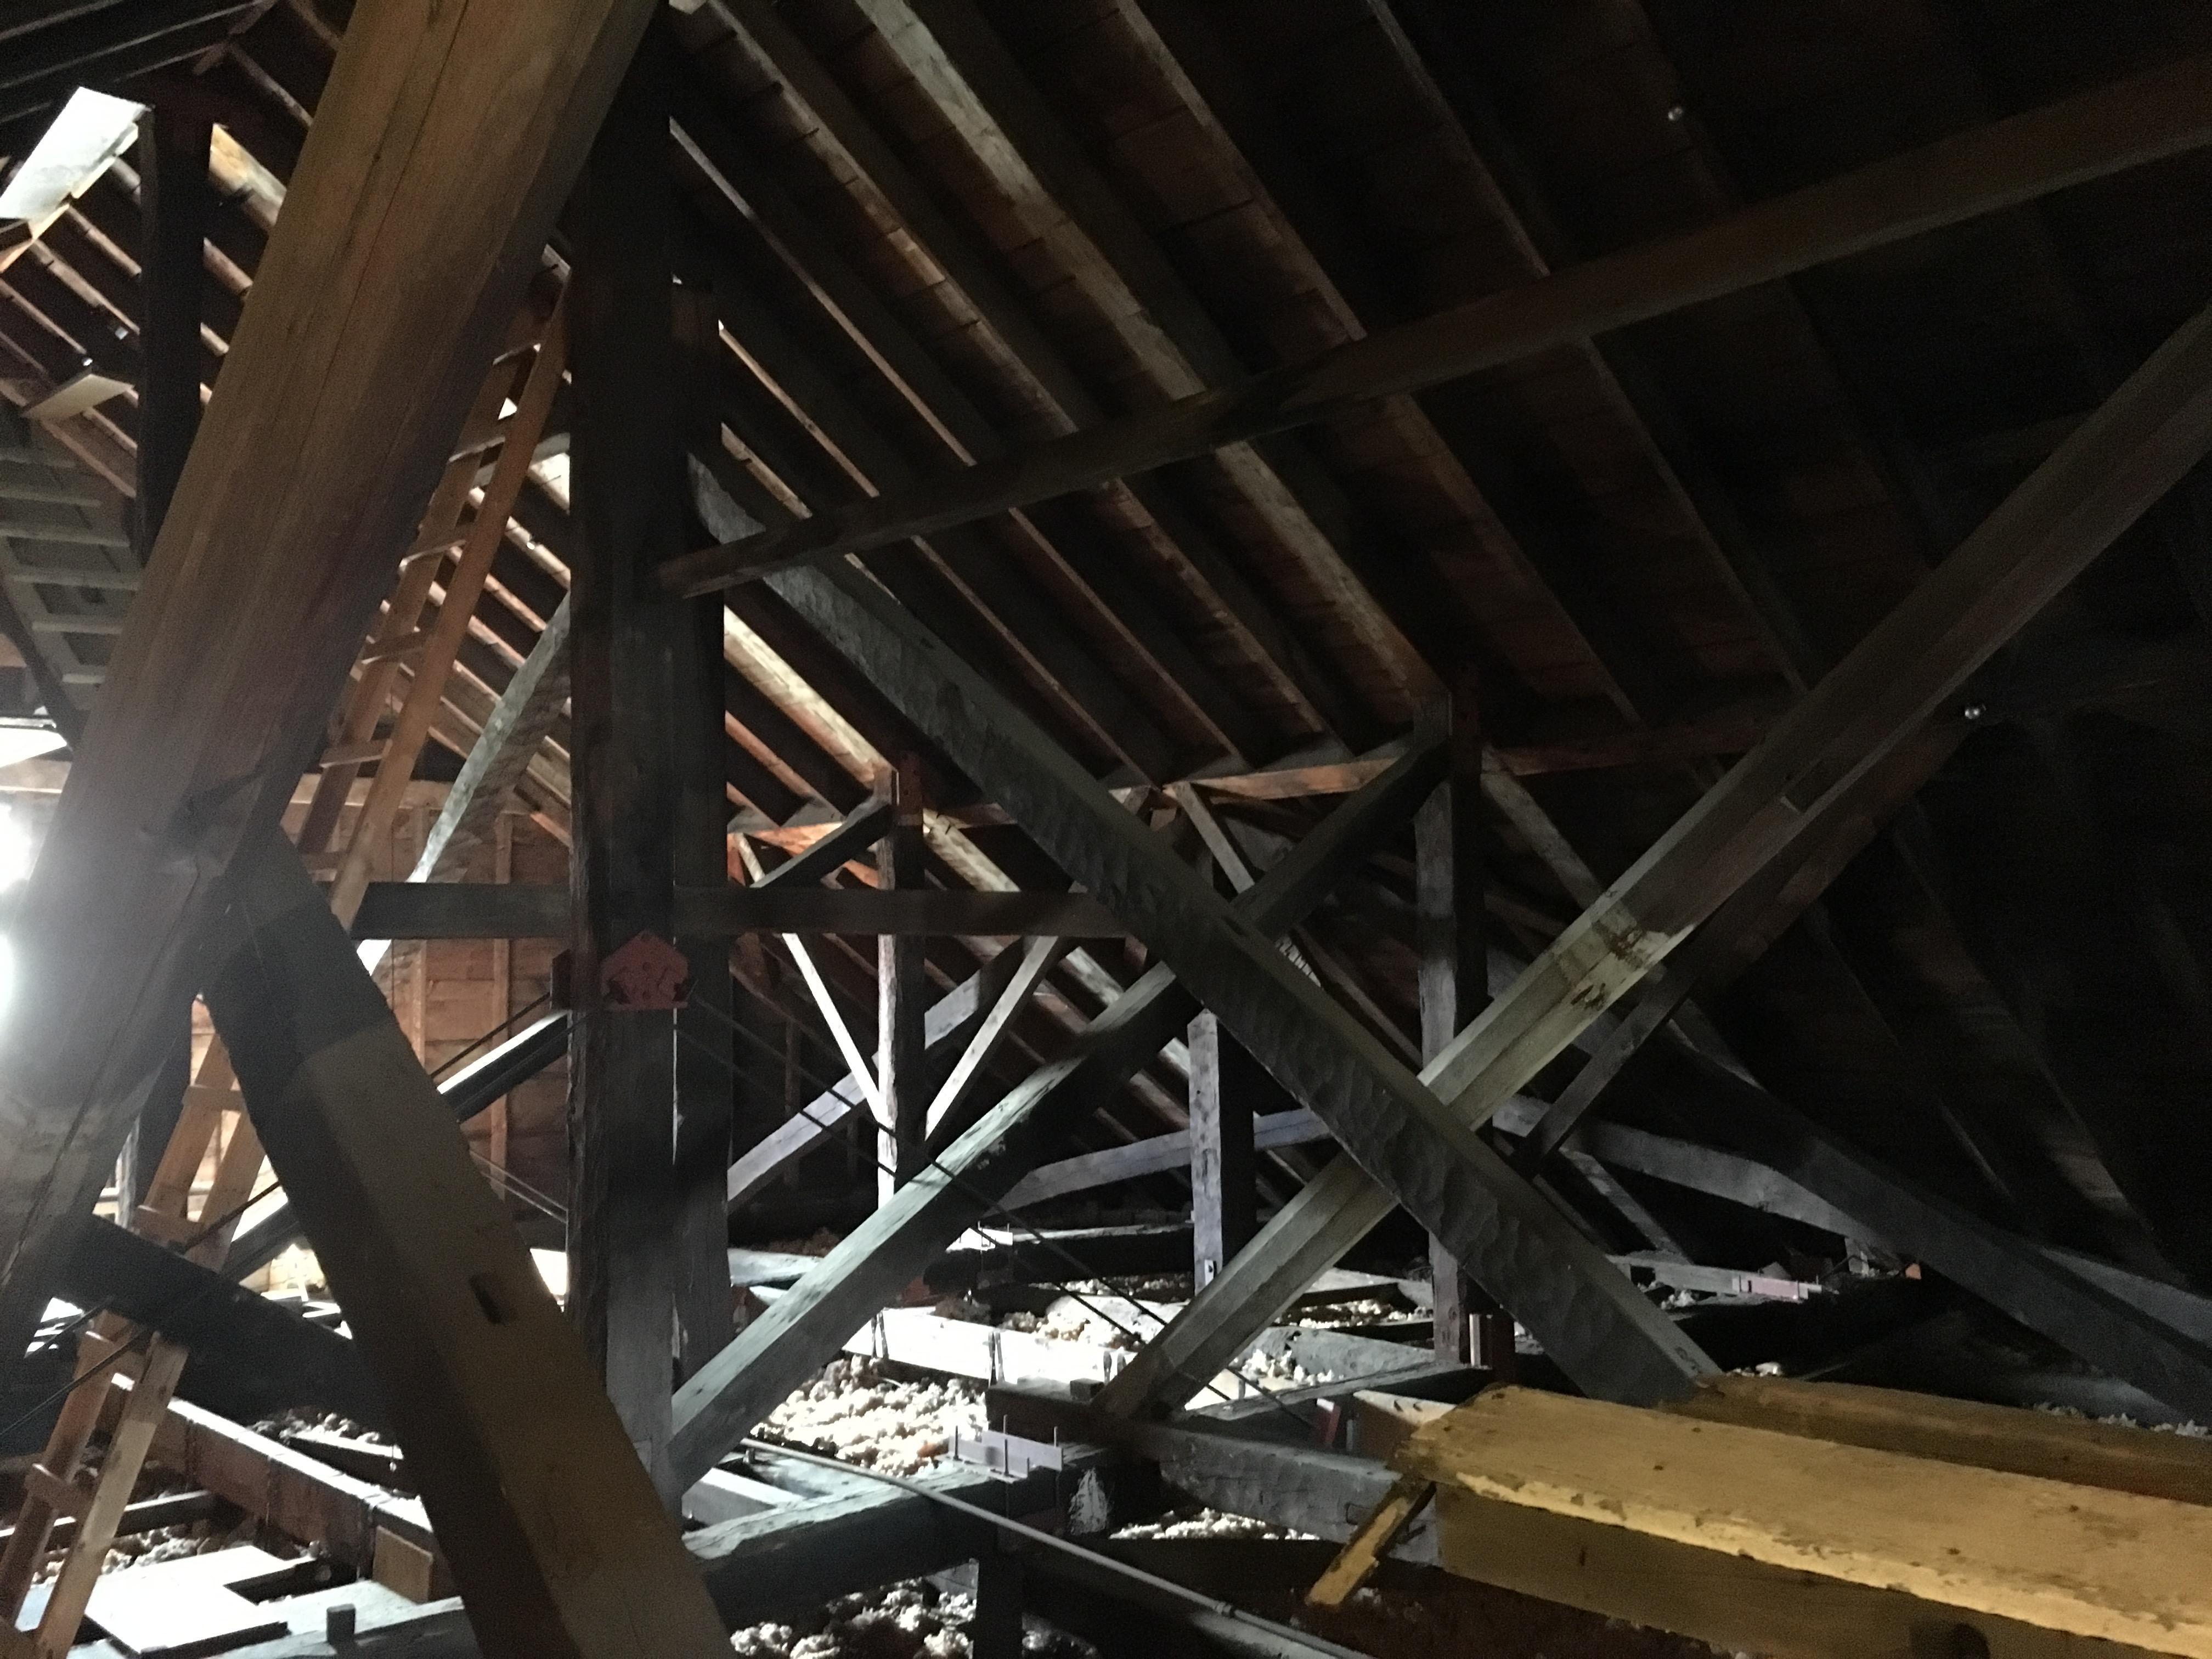 Church attic